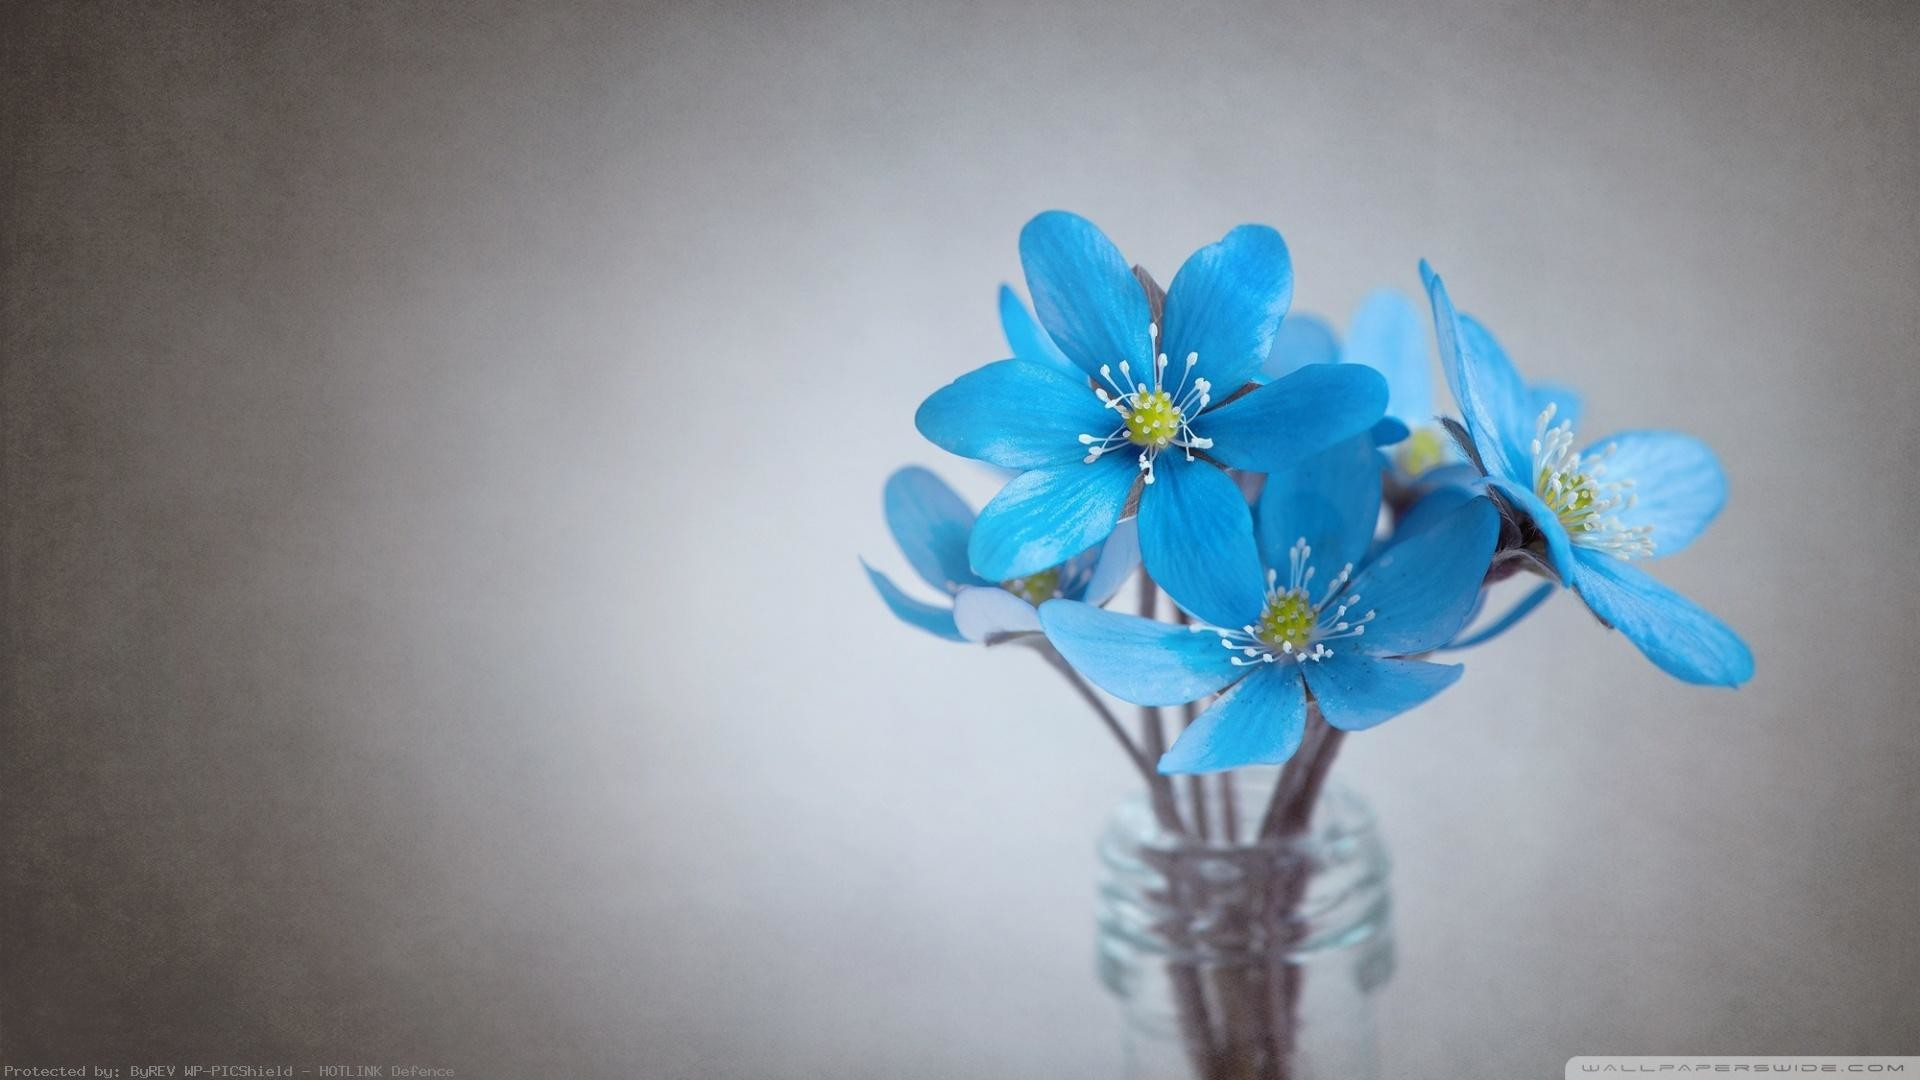 Cute-Love-Full-HD-Download-Desktop-Mobile-Backgrounds-